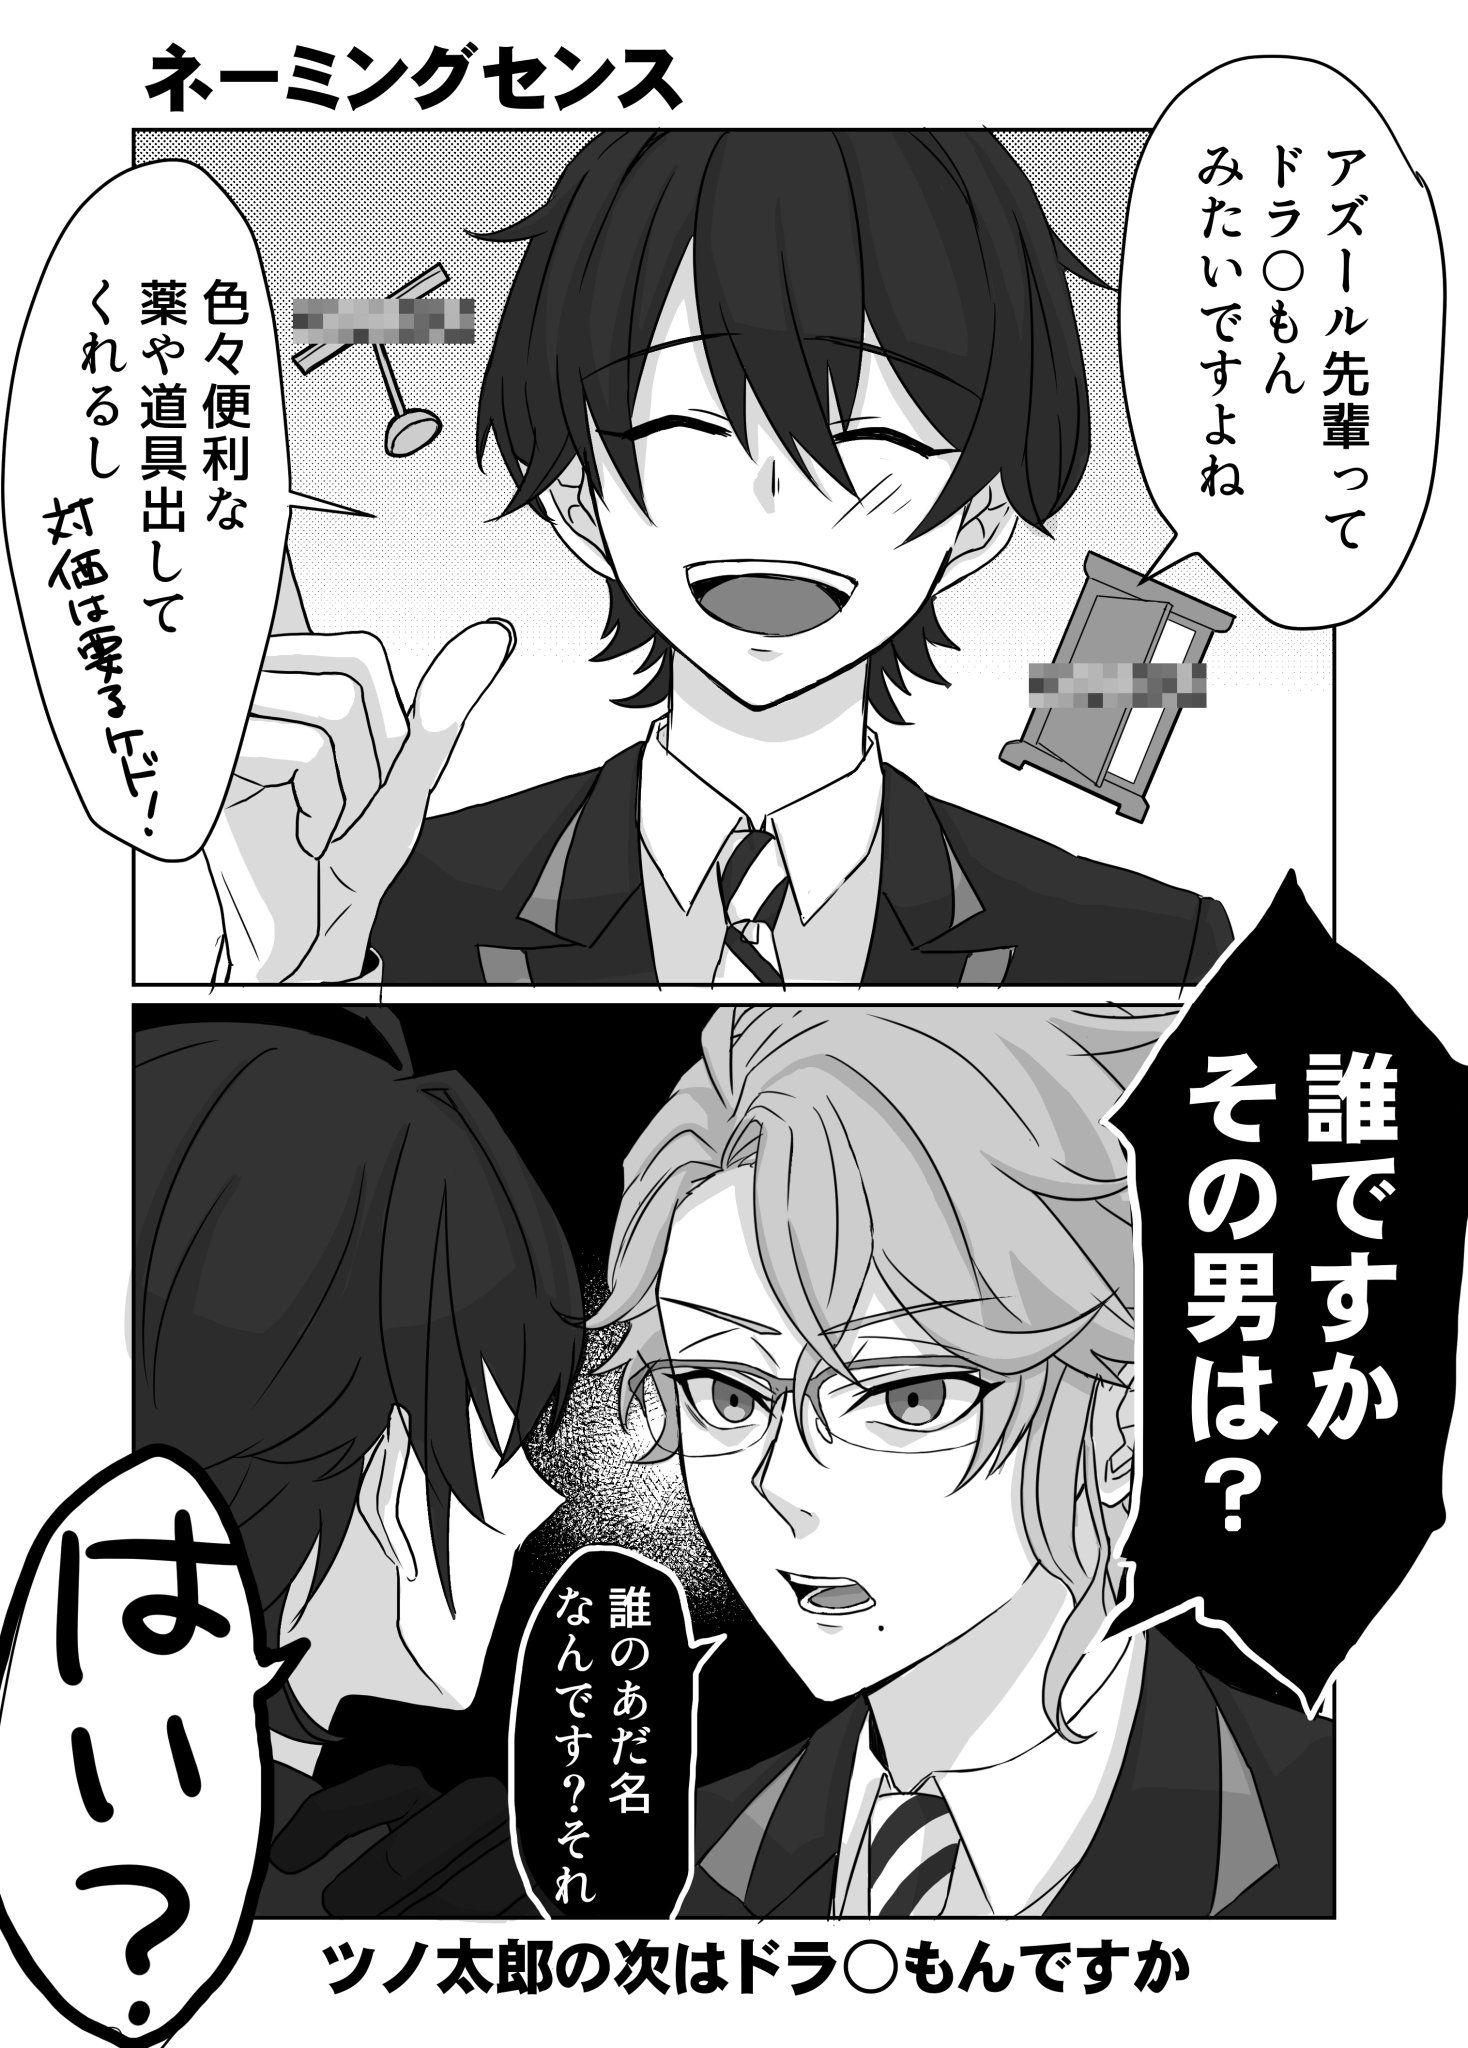 twitter 漫画 言い回し アニメ